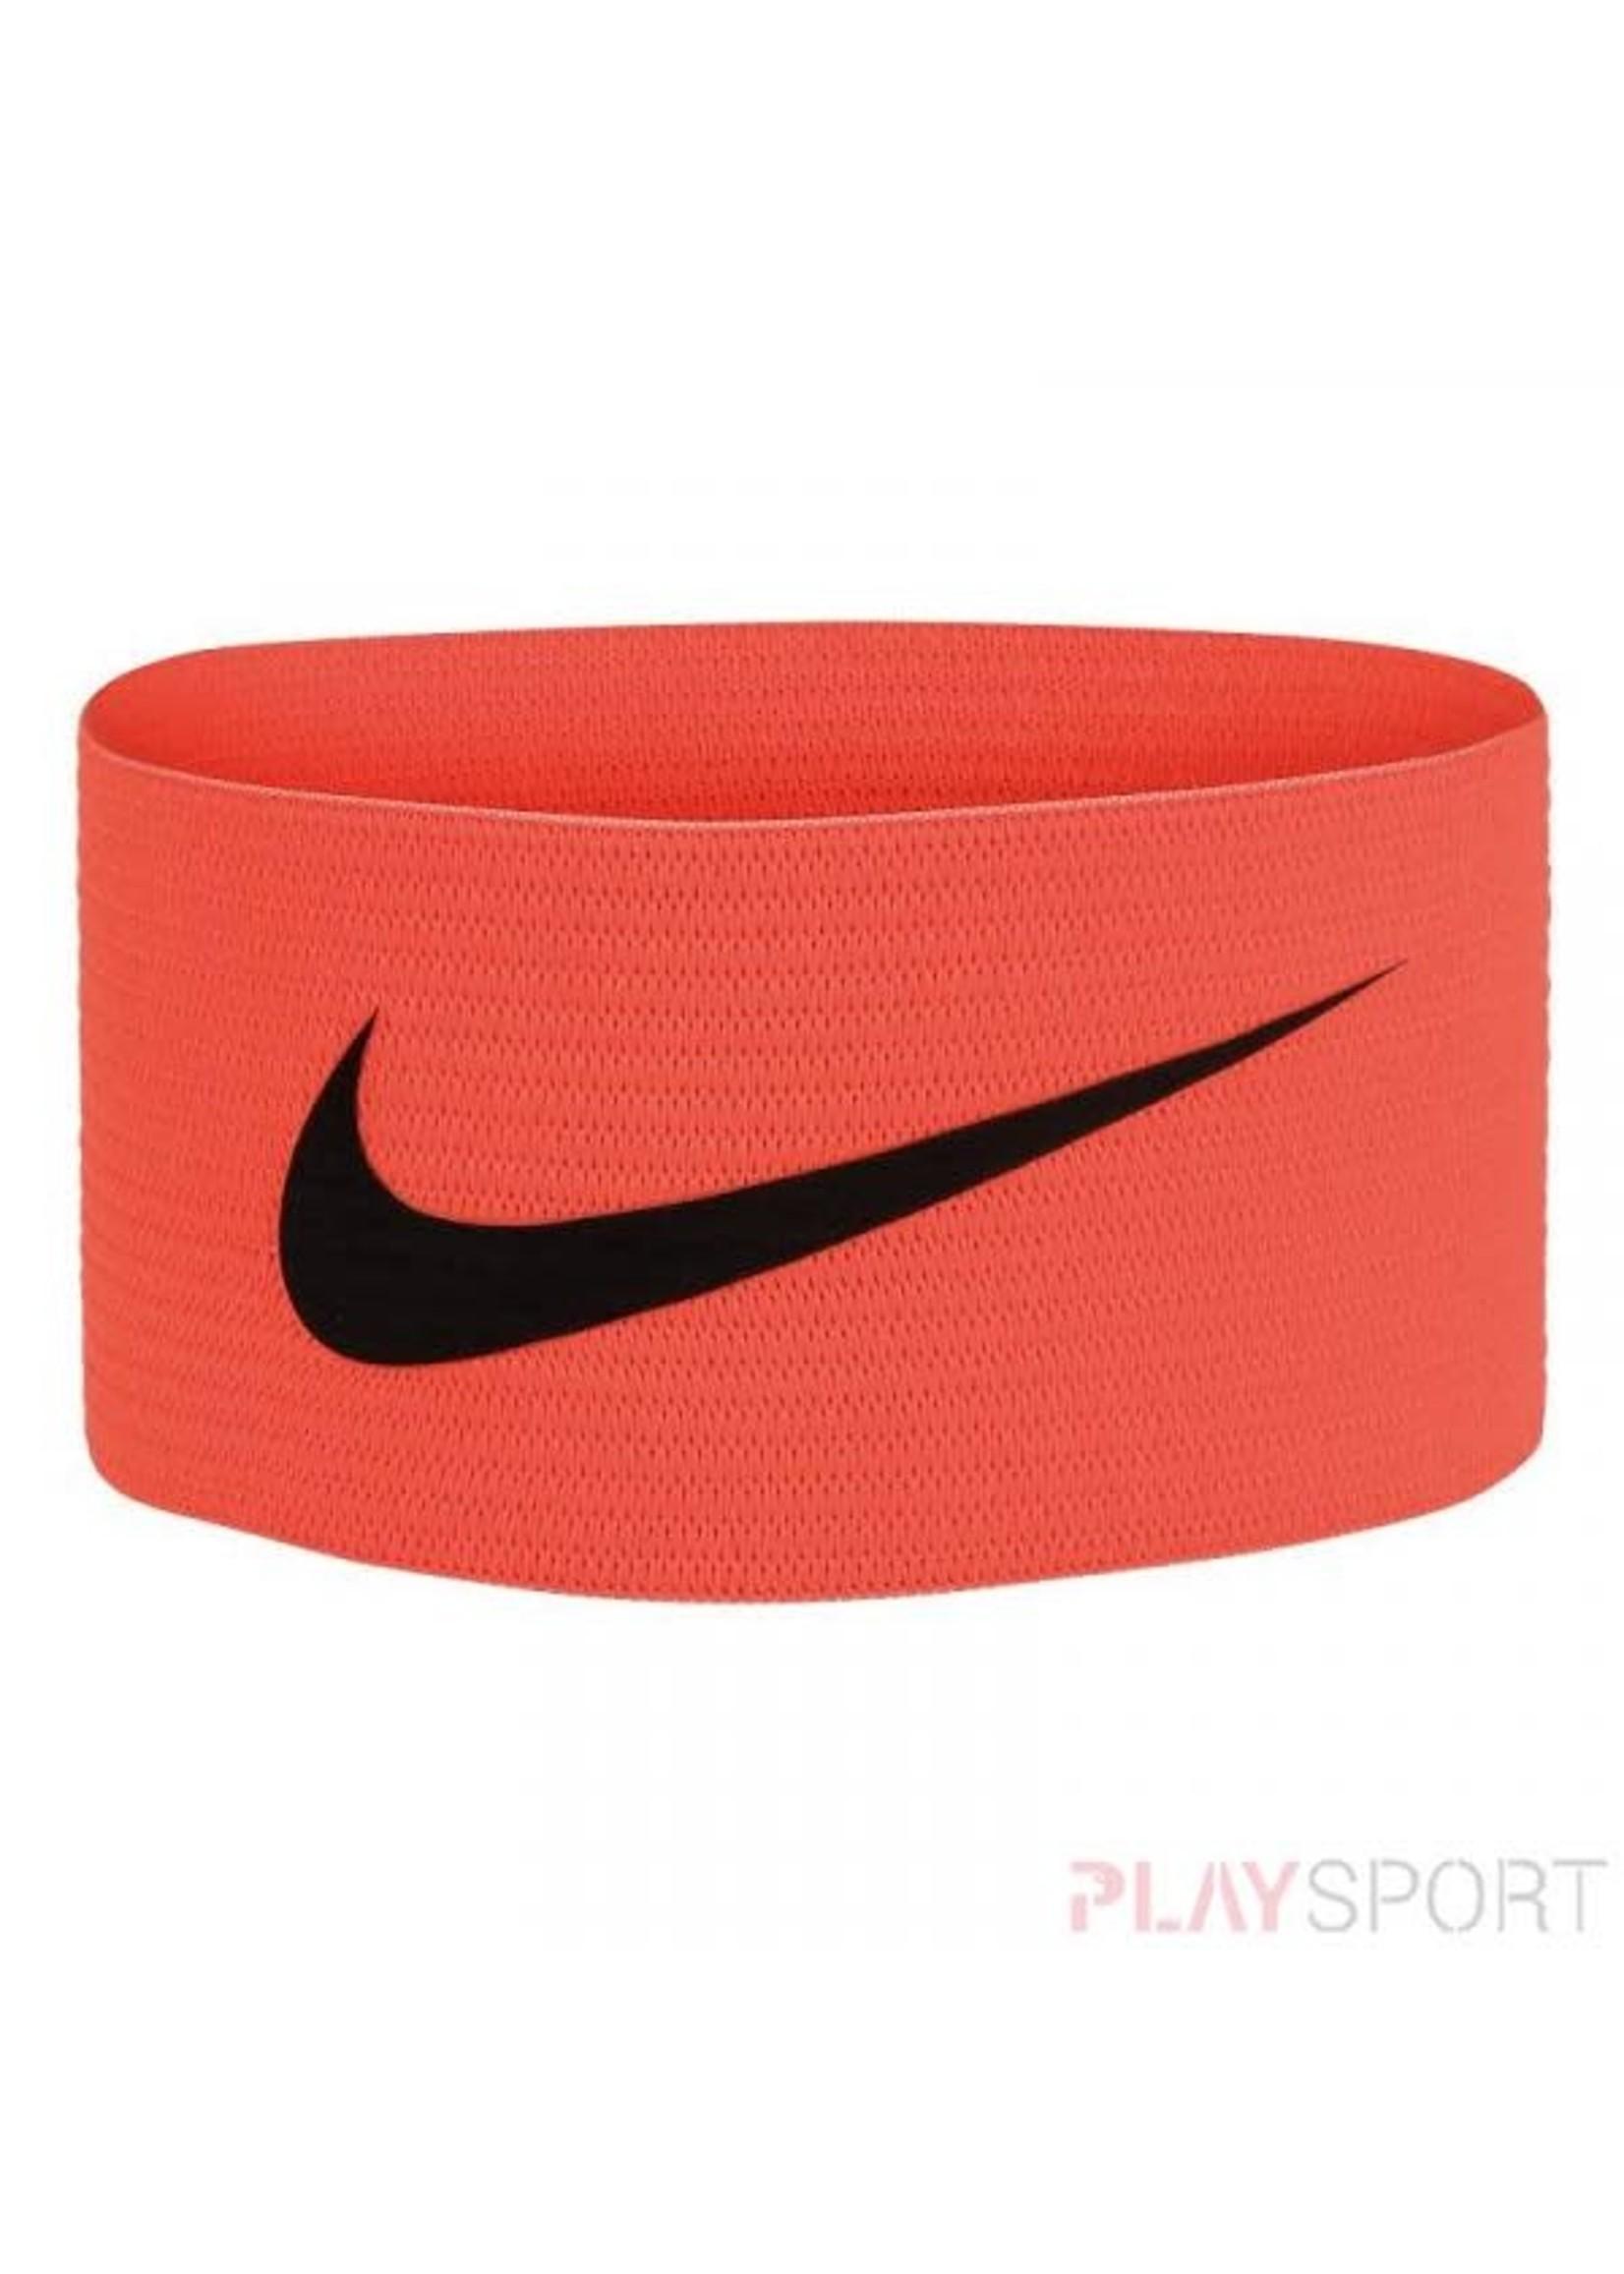 Nike Futbol Arm Band 2.0 - Neon Orange